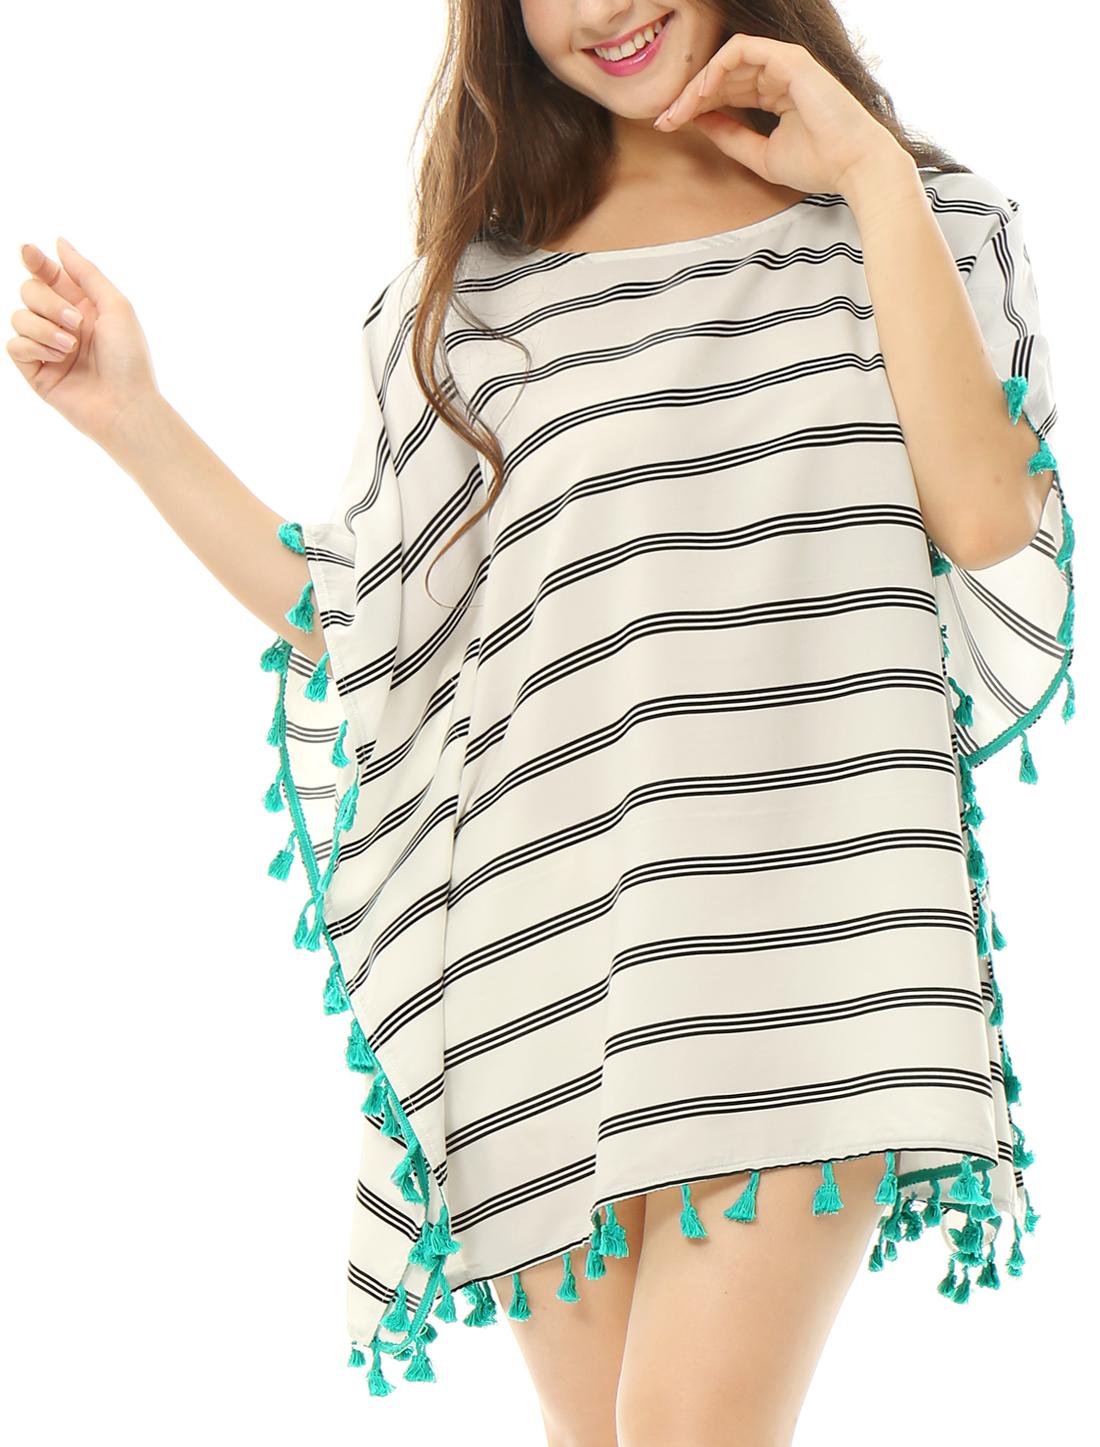 Women Tassel Trim Loose Stripes Cover Up Tunic Top White L